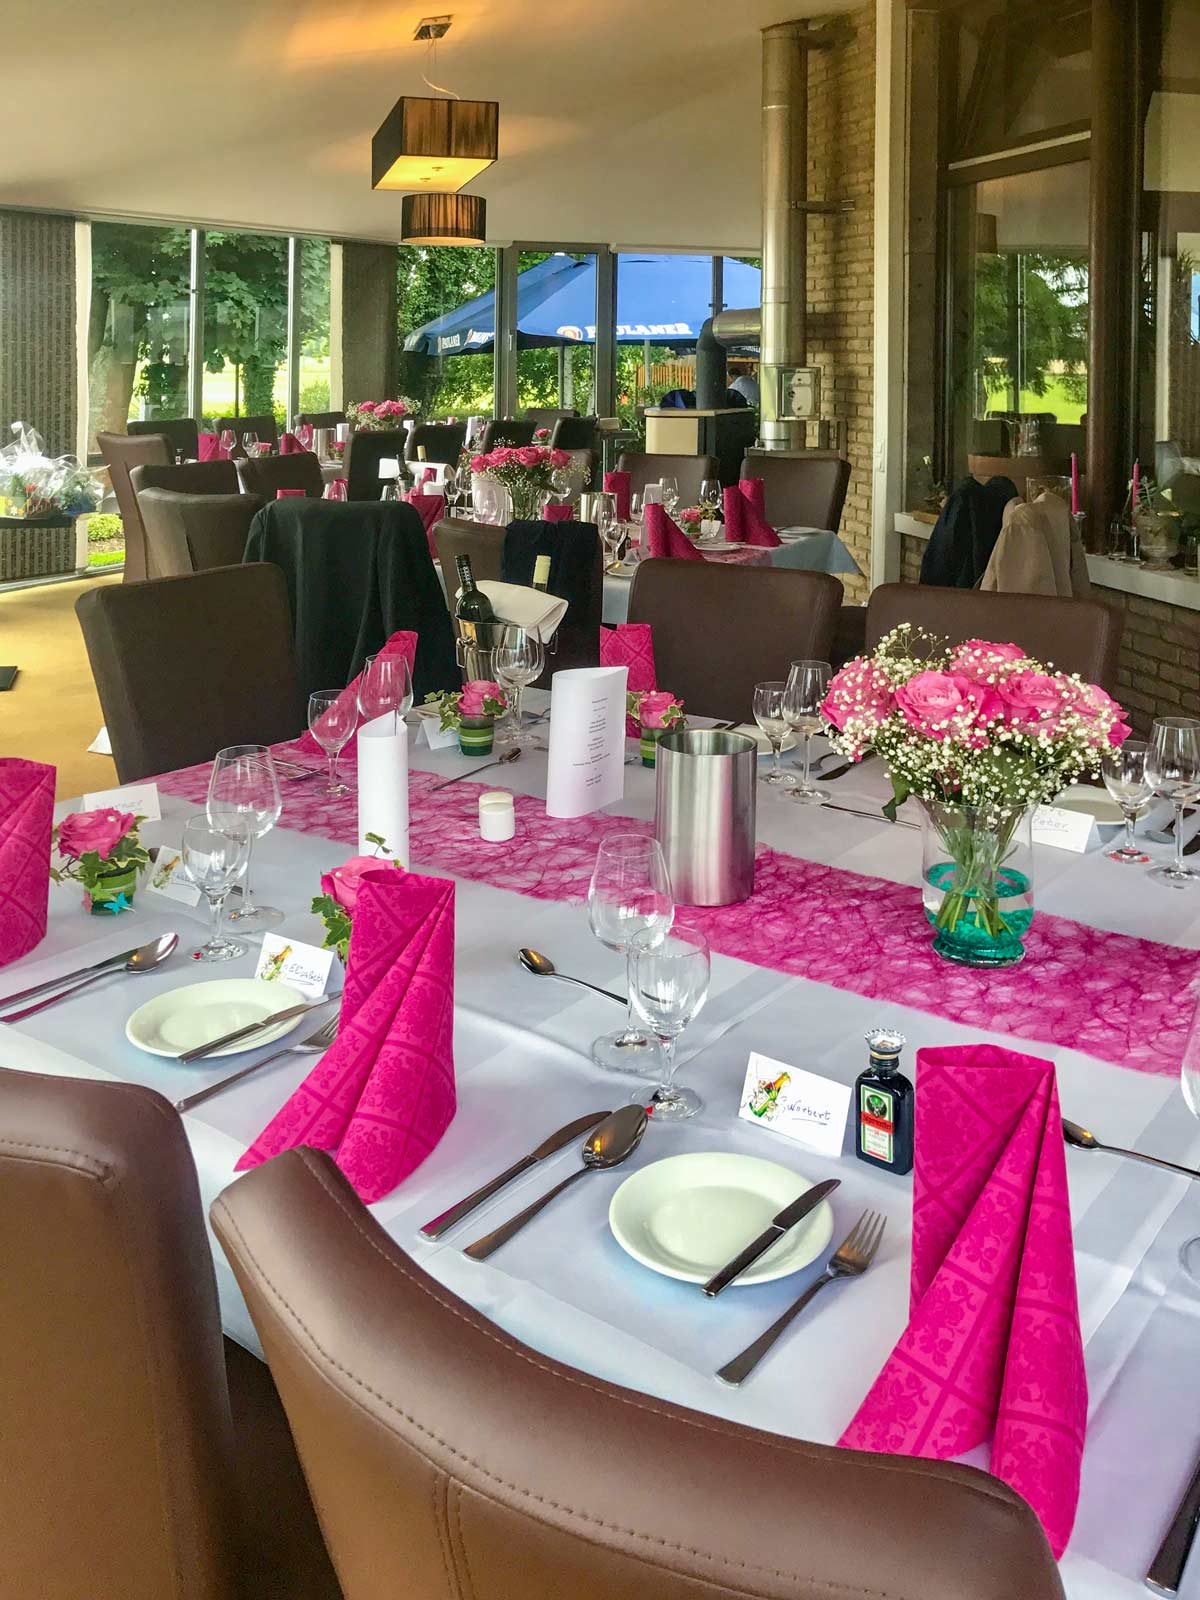 Veranstaltung Restaurant Würselen